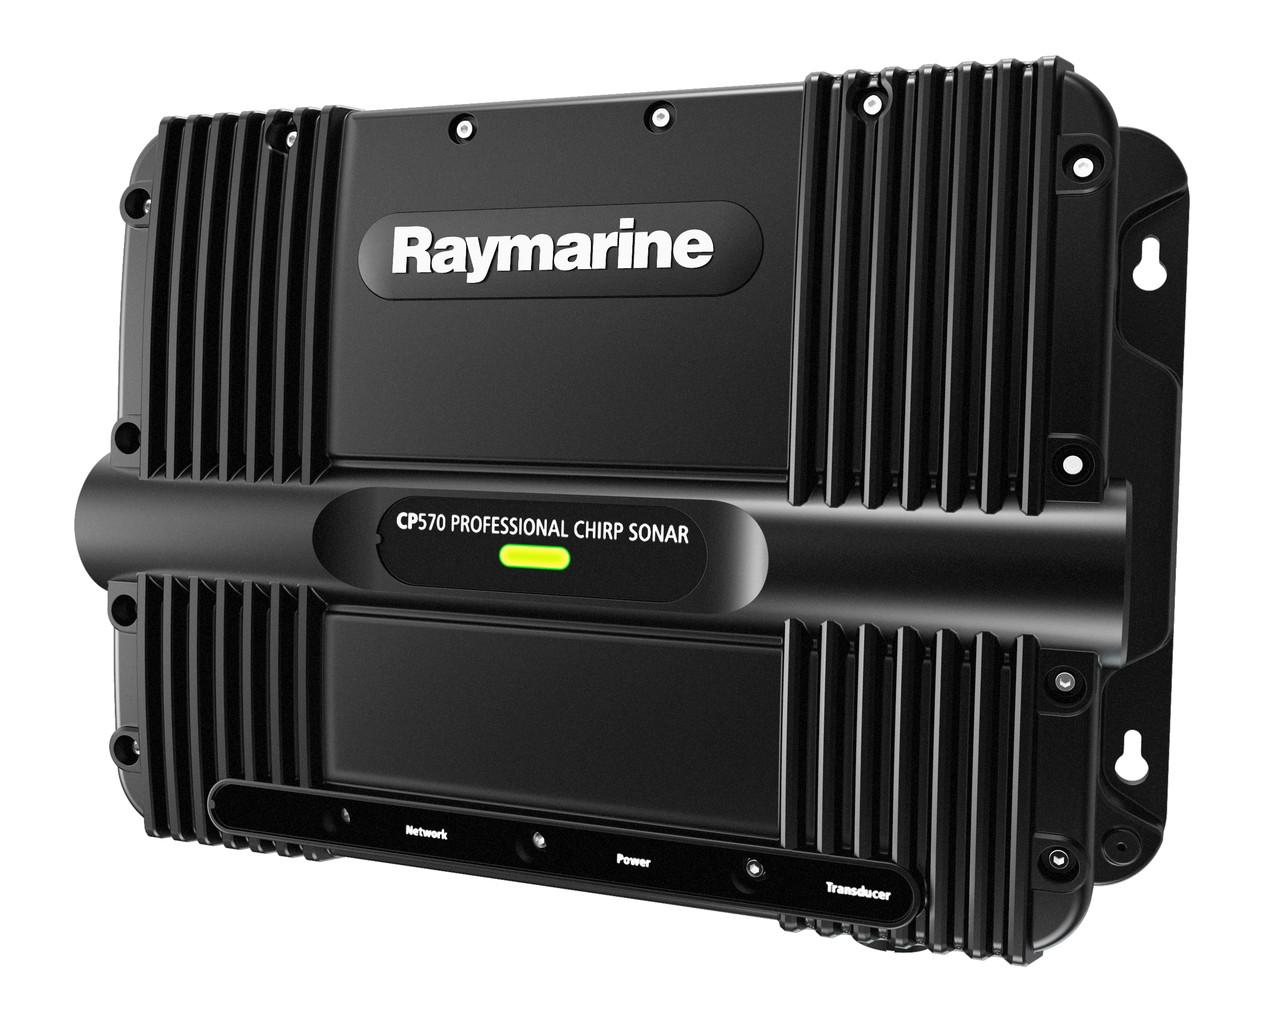 Raymarine CP570 ClearPulse Chirp Sonar Module Fishfinder Right View